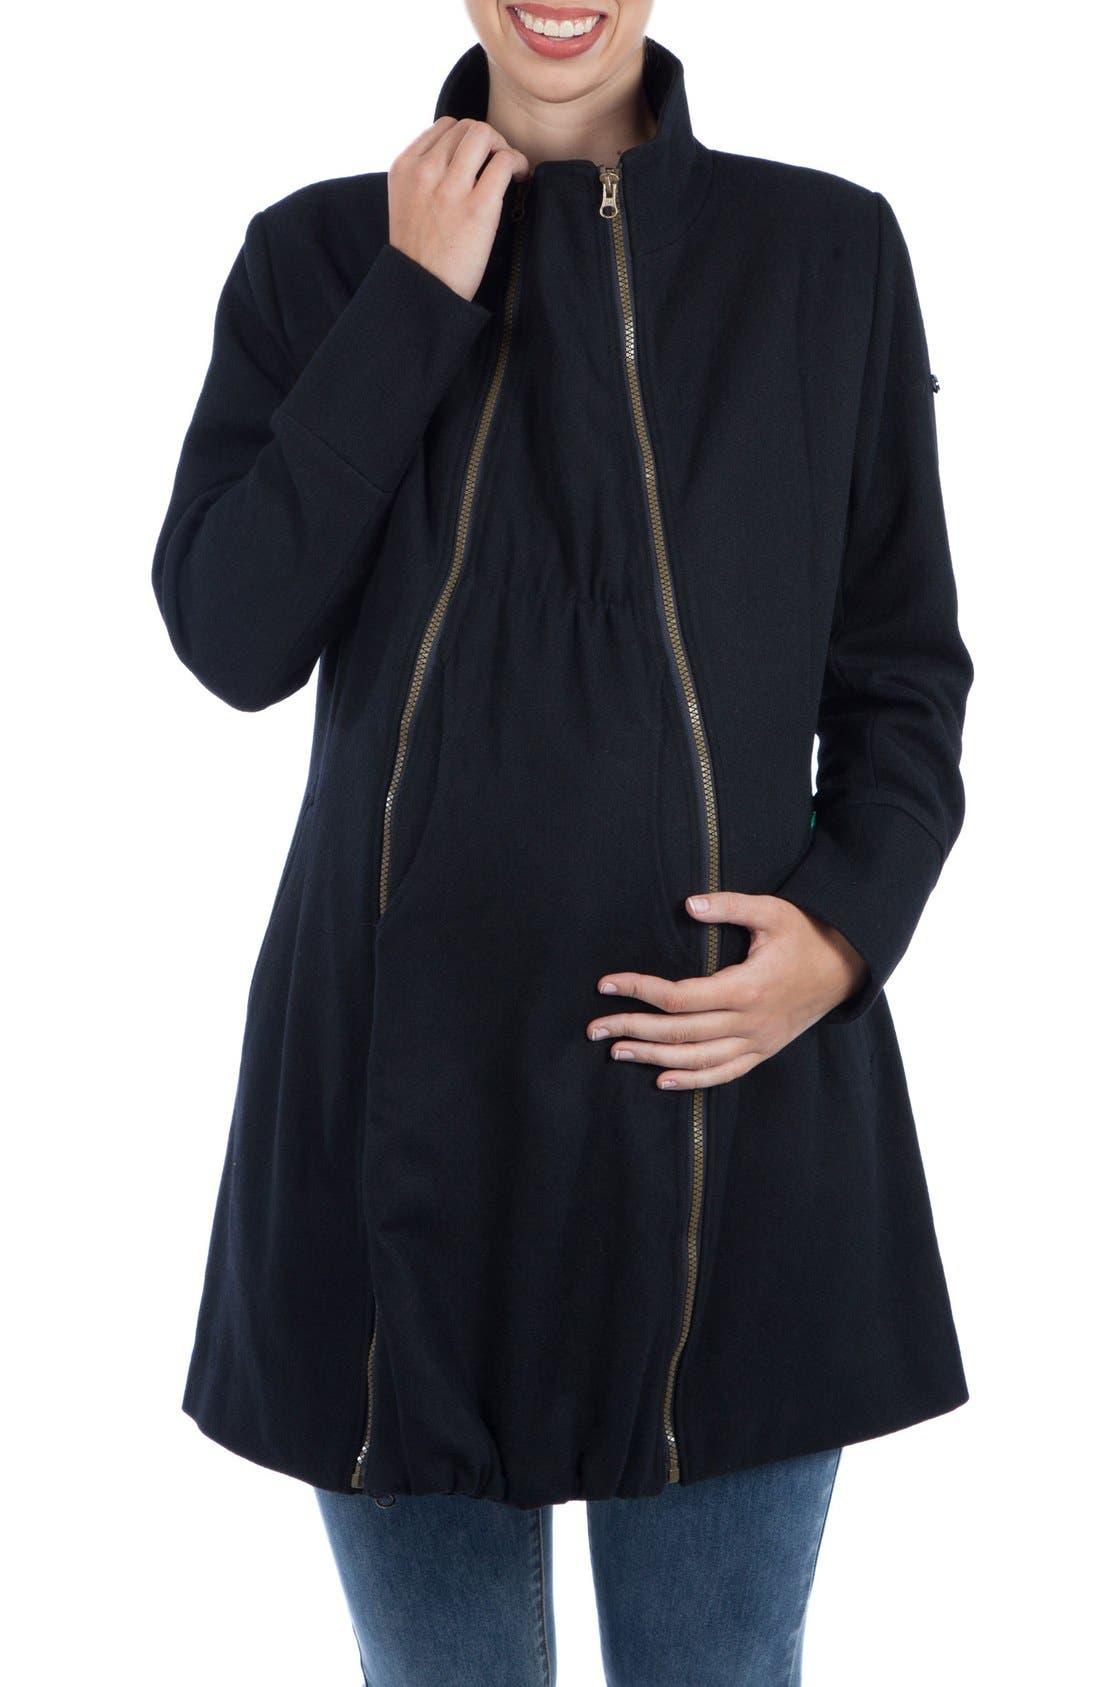 Convertible 3-in-1 Maternity/Nursing Coat,                             Main thumbnail 1, color,                             BLACK